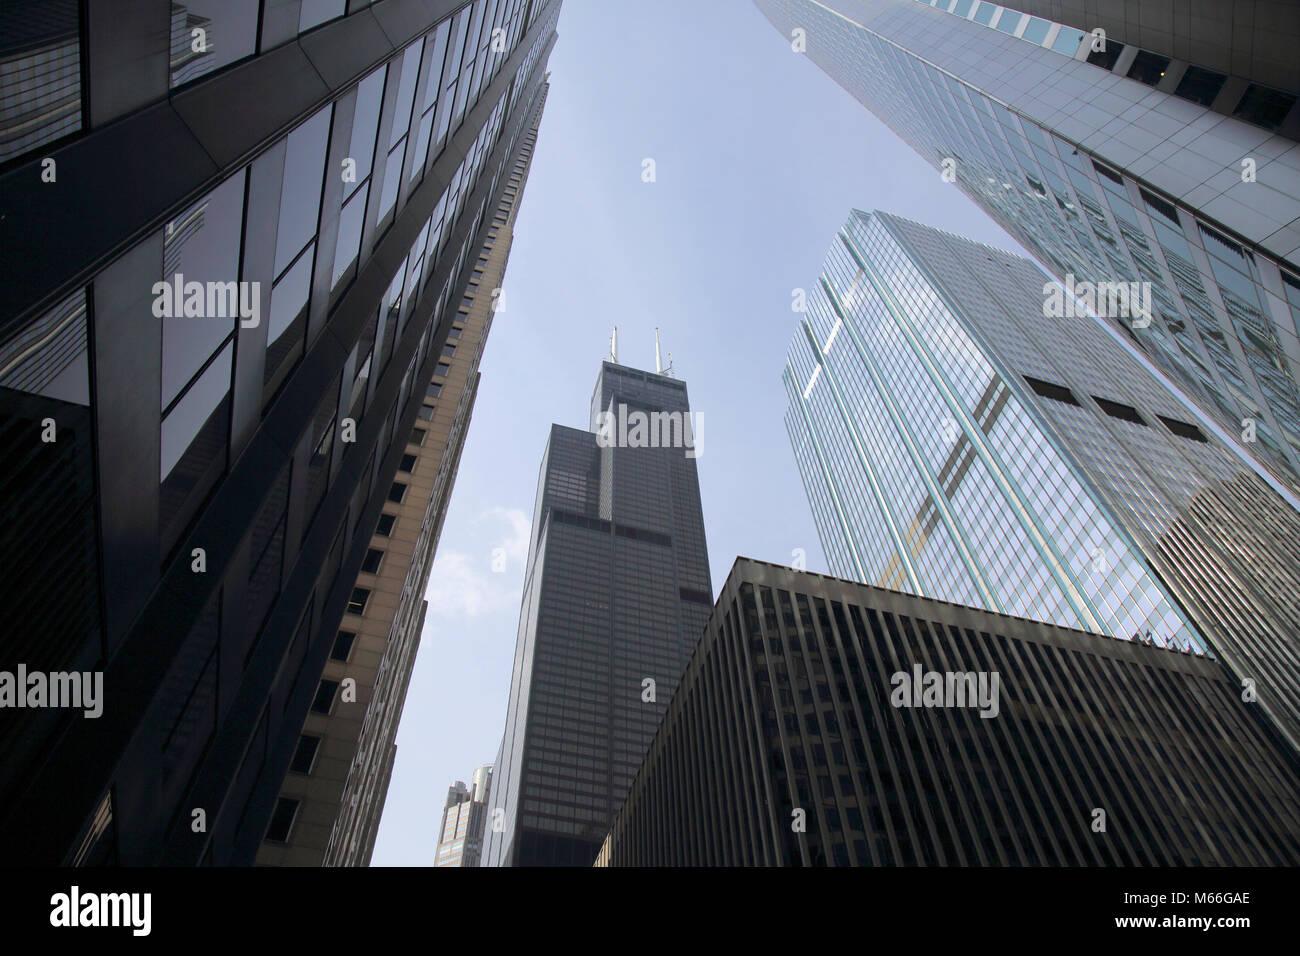 the willis tower chicago Illinois - Stock Image